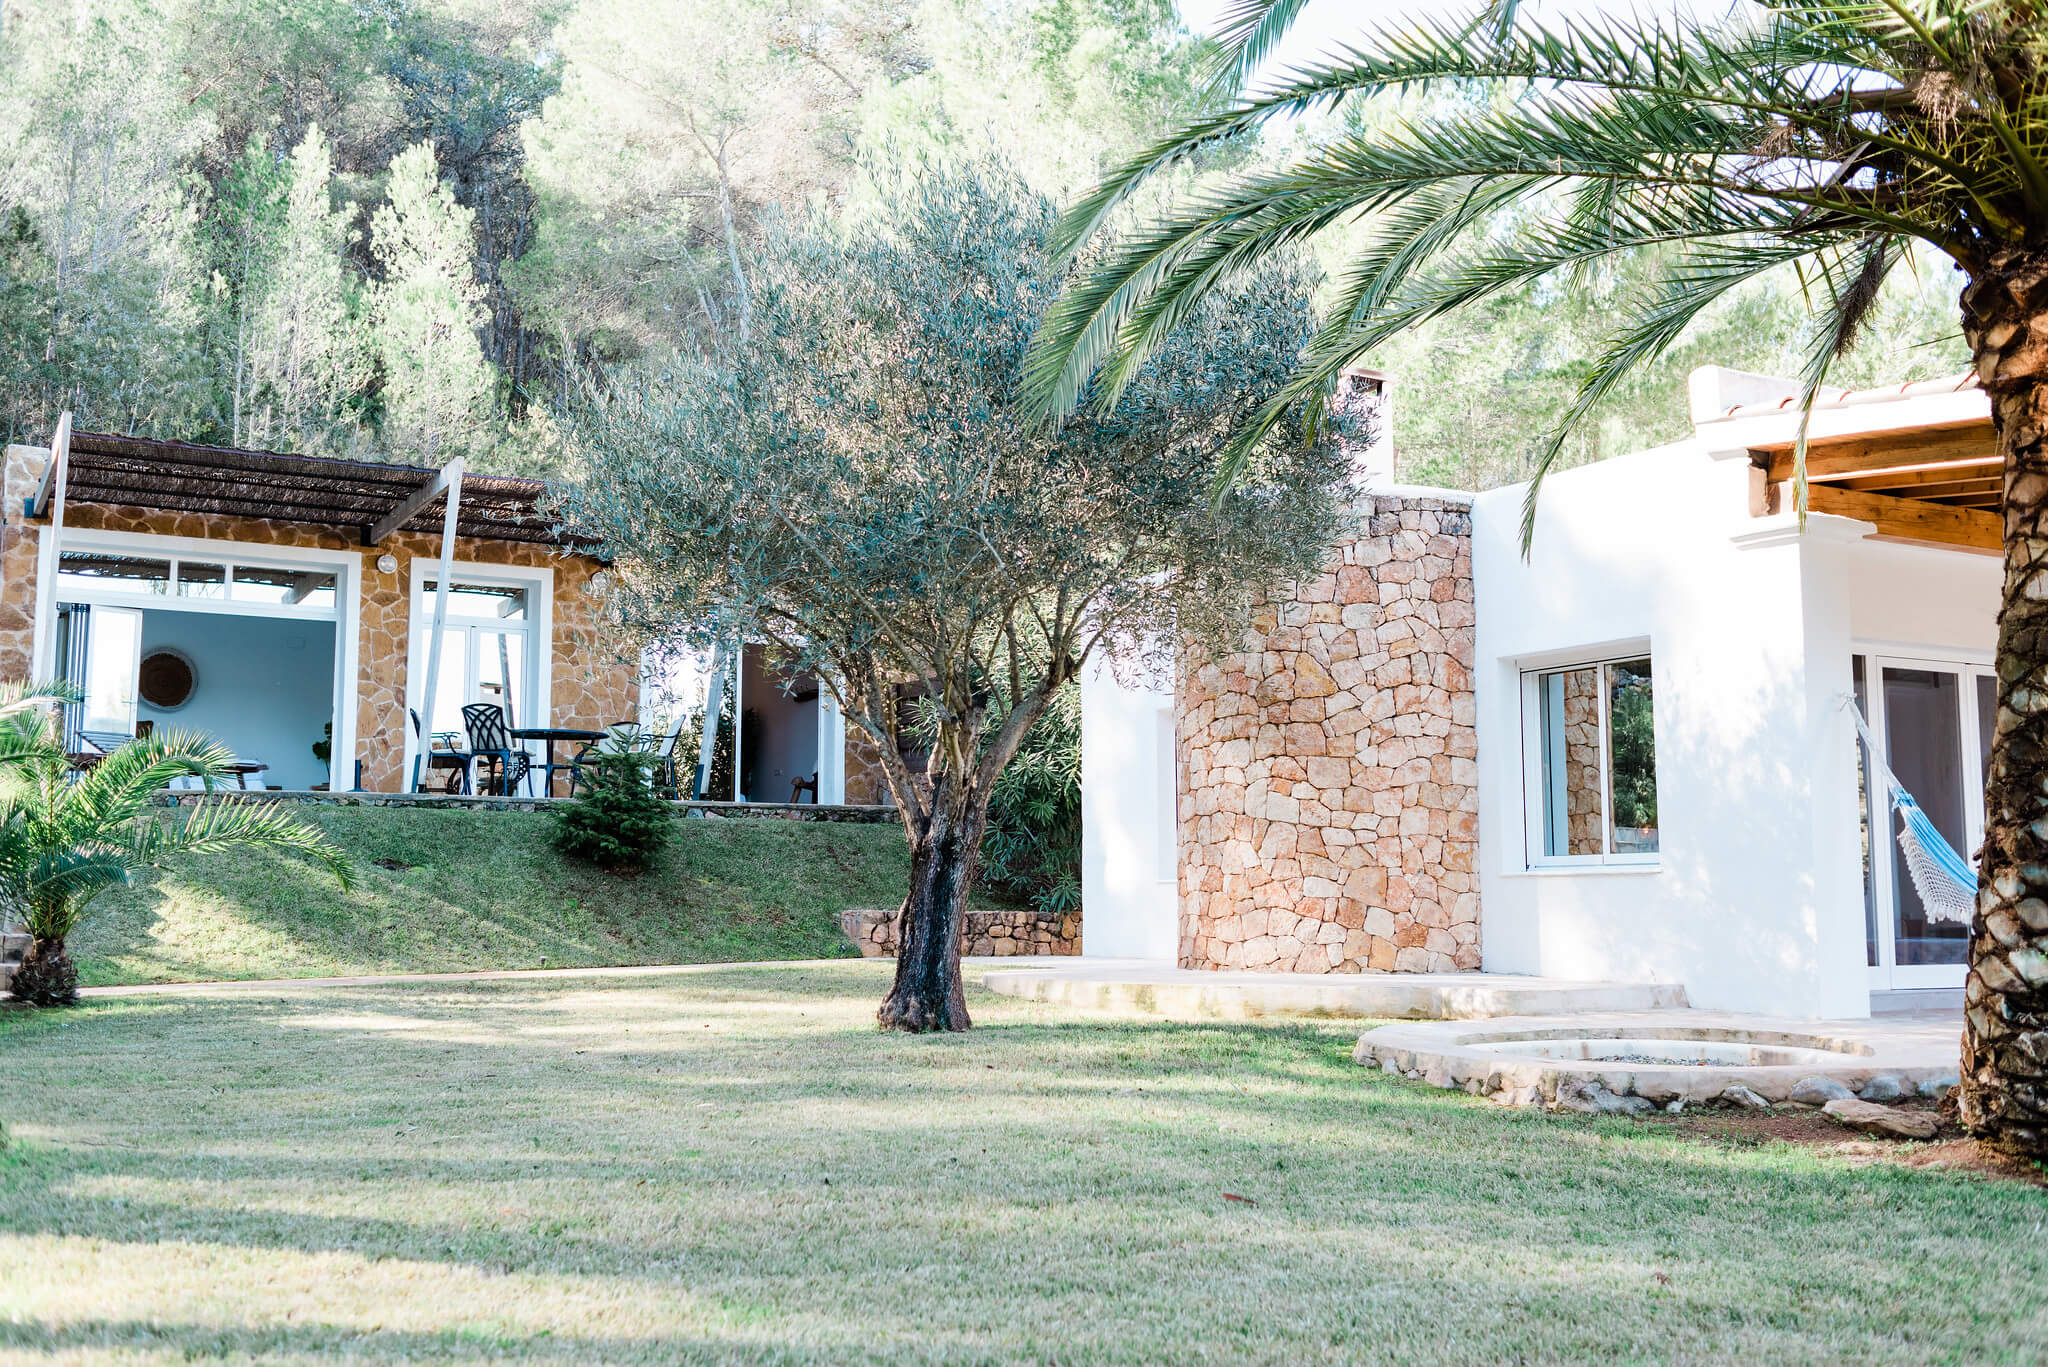 https://www.white-ibiza.com/wp-content/uploads/2020/05/white-ibiza-villas-can-verde-exterior-garden-views.jpg